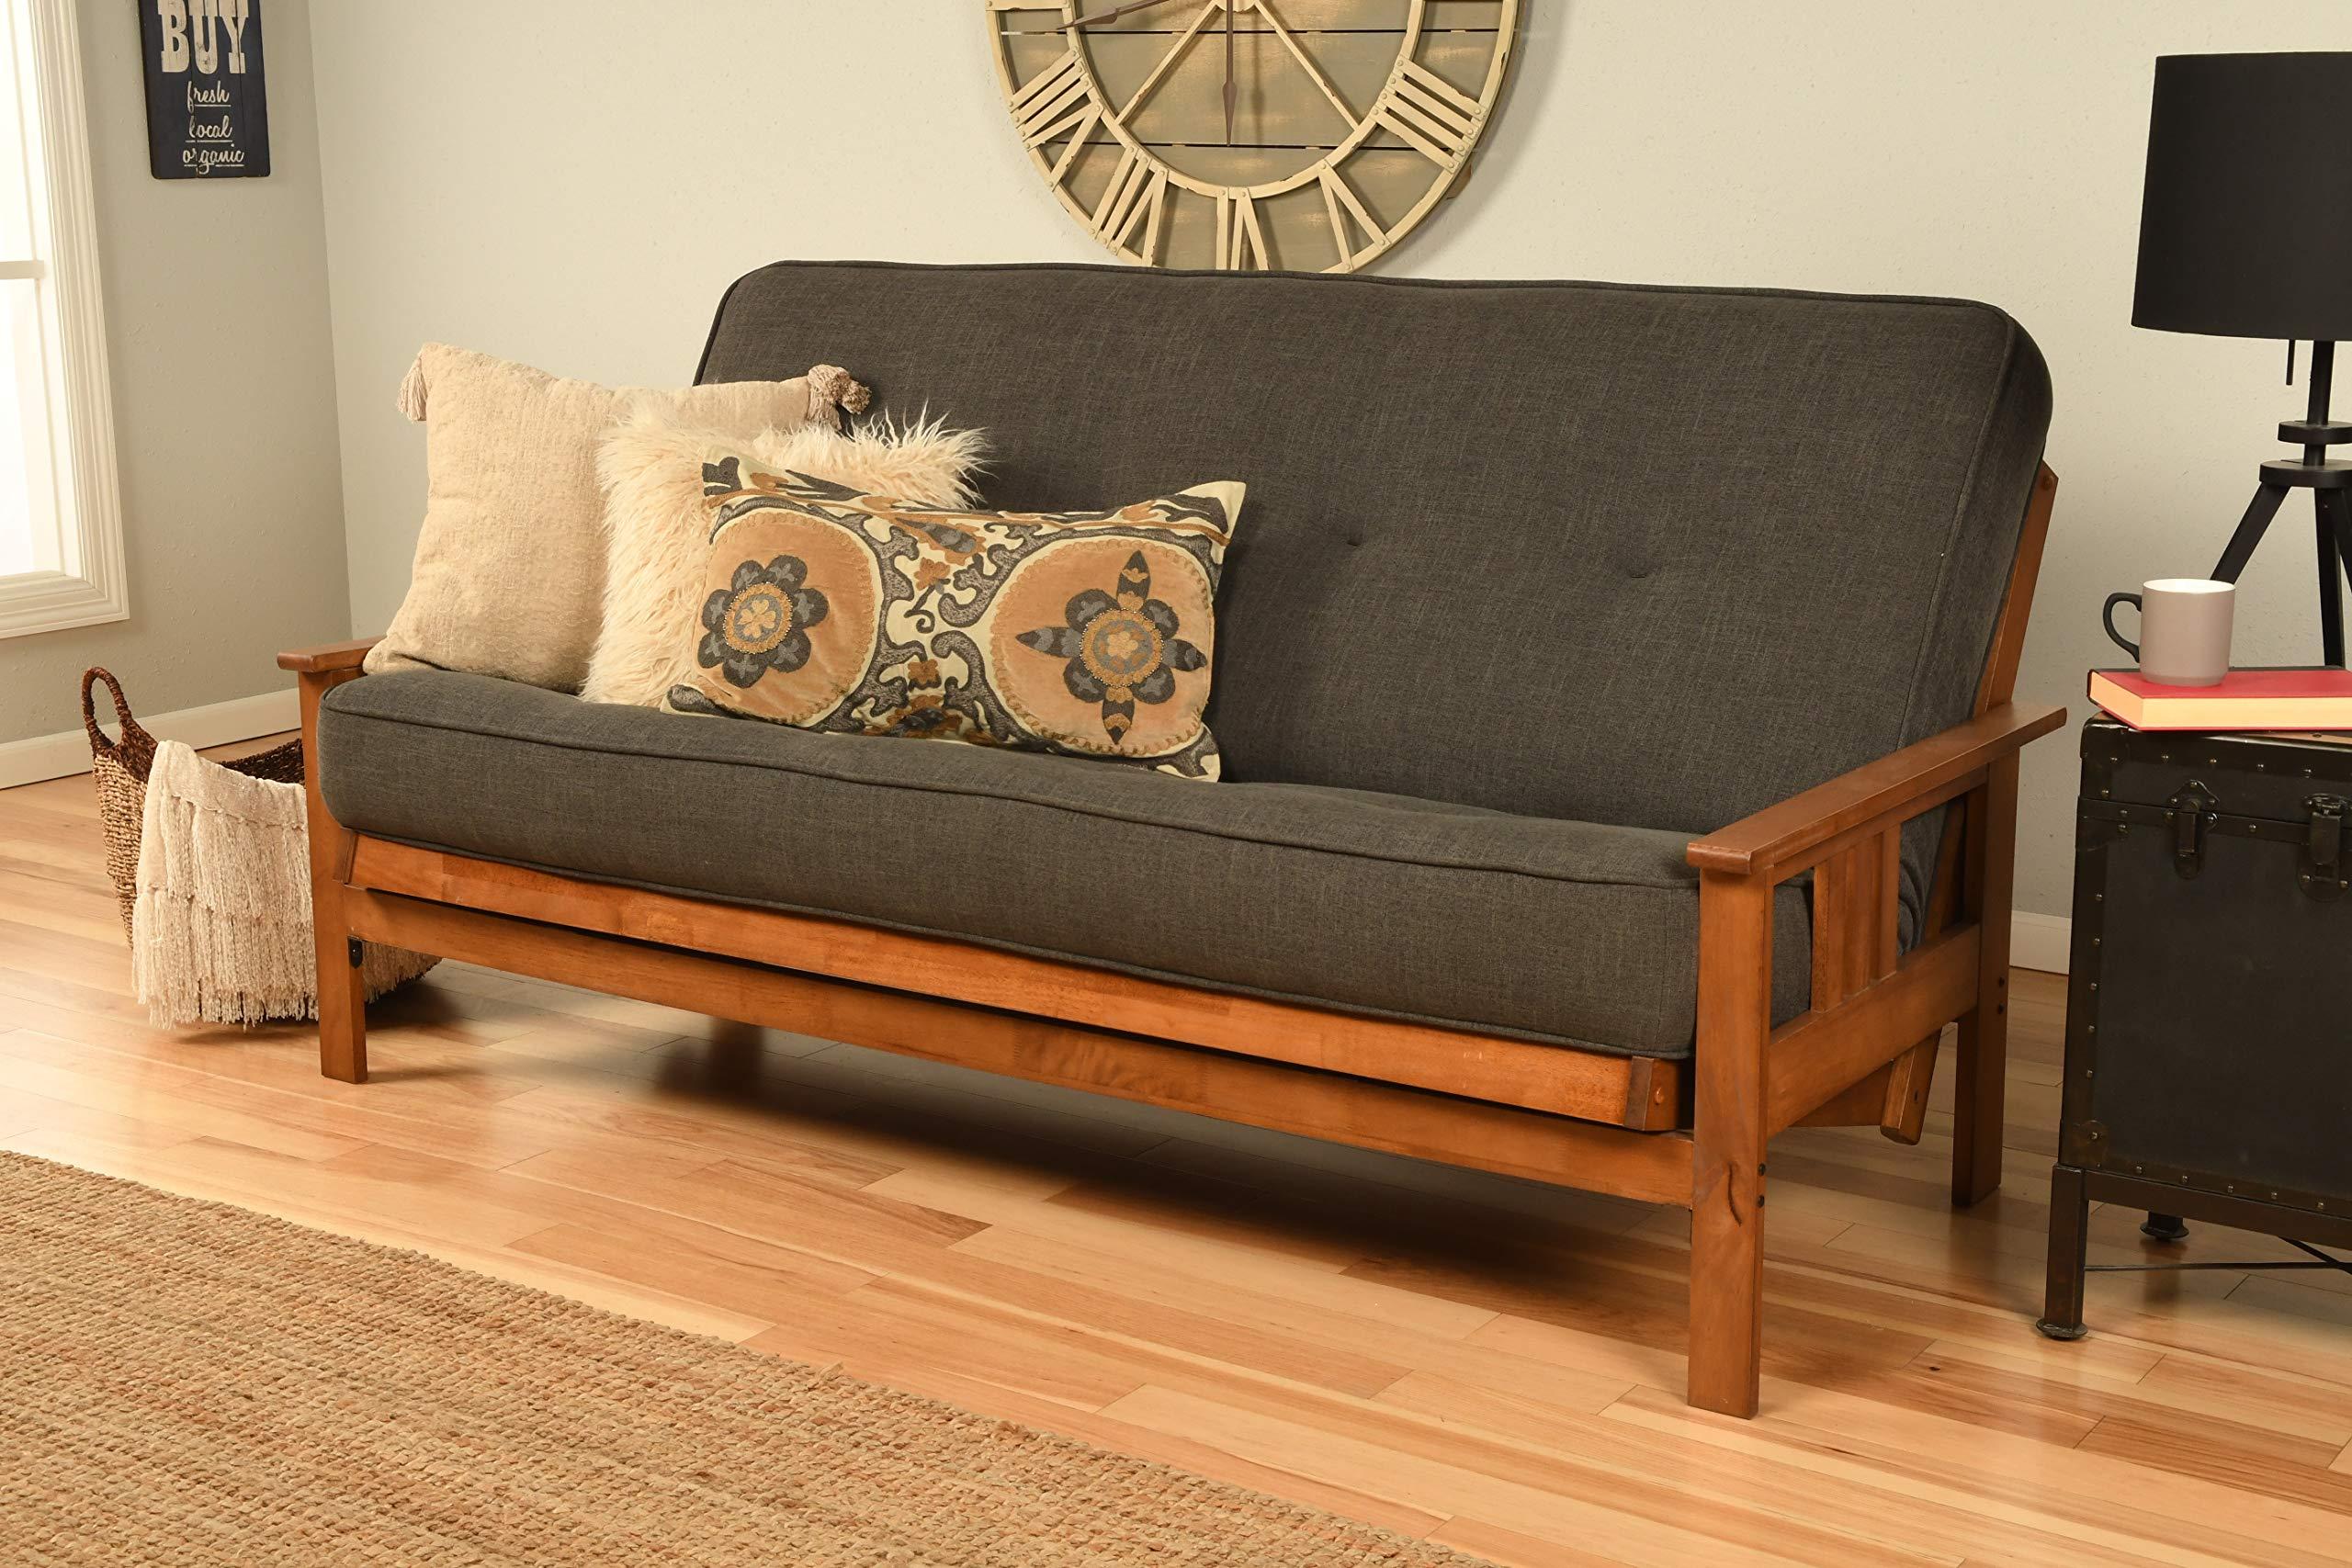 Kodiak Furniture Monterey Futon Set with Barbados Finish, Full, Linen Charcoal